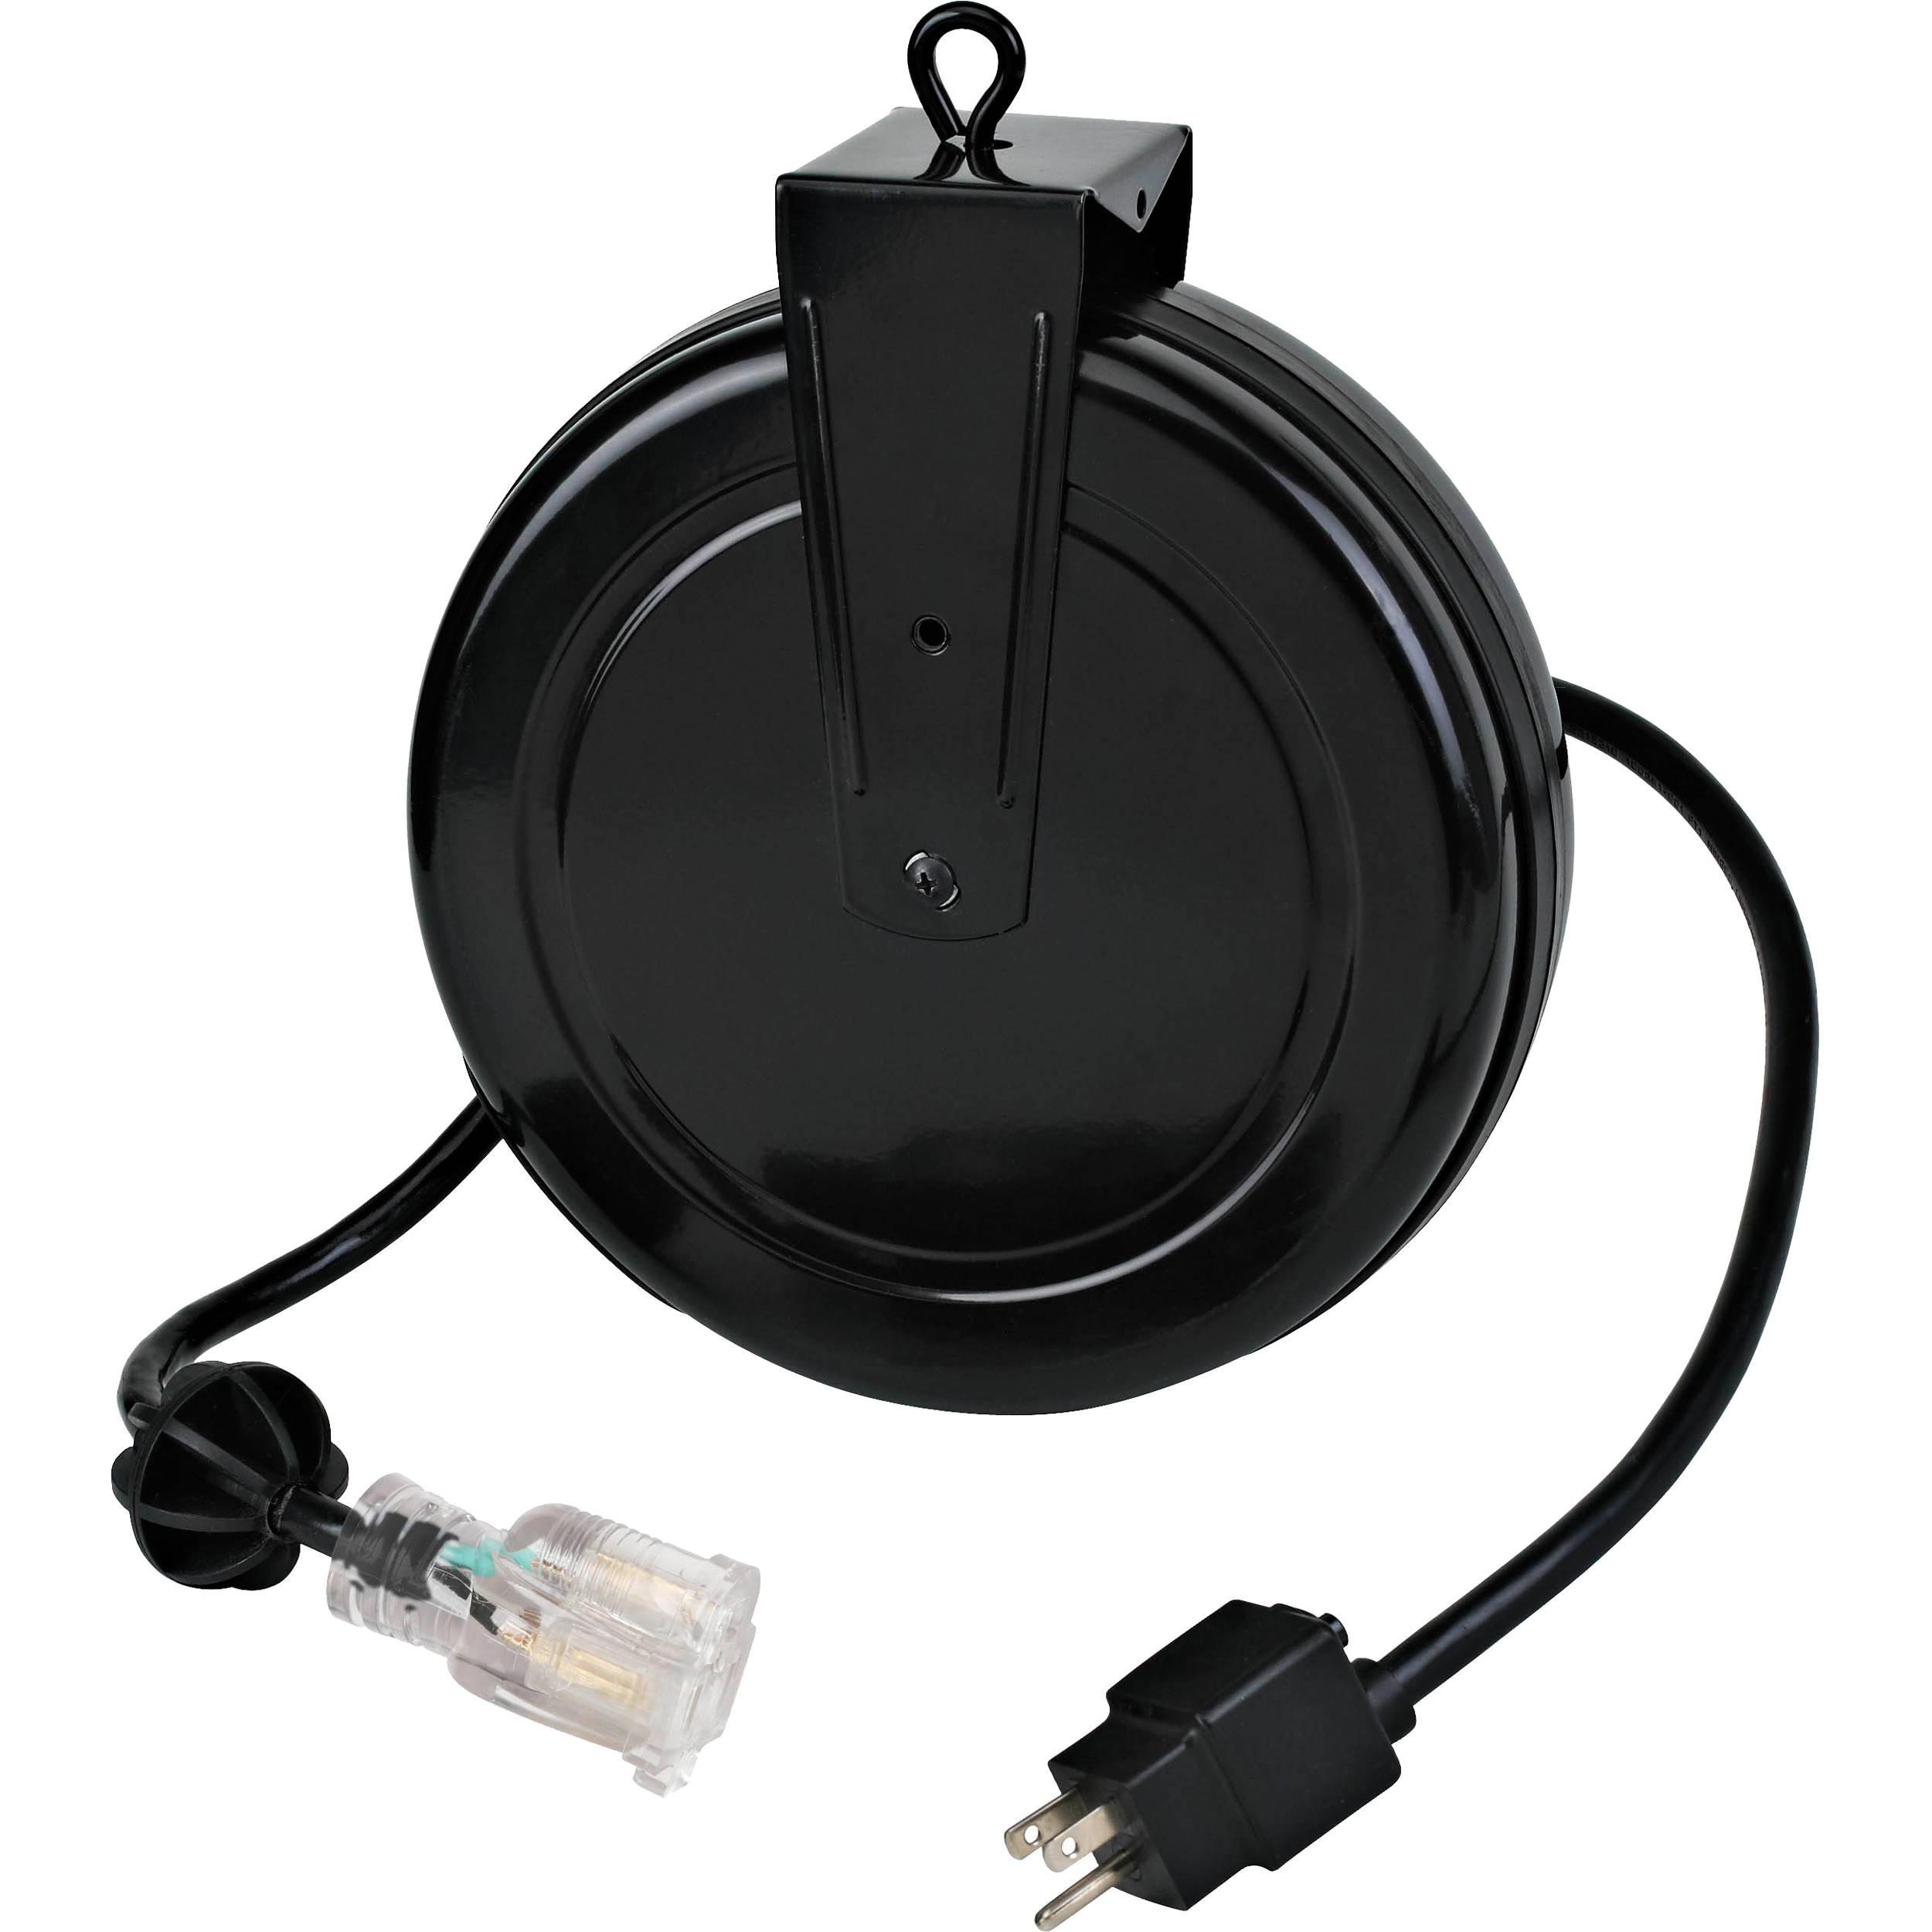 Https C Product 1045164 Reg Logitech Webcam C300 Wiring Diagram Stage Ninja Stx 20 1 12 Awg Sjtow 1071340